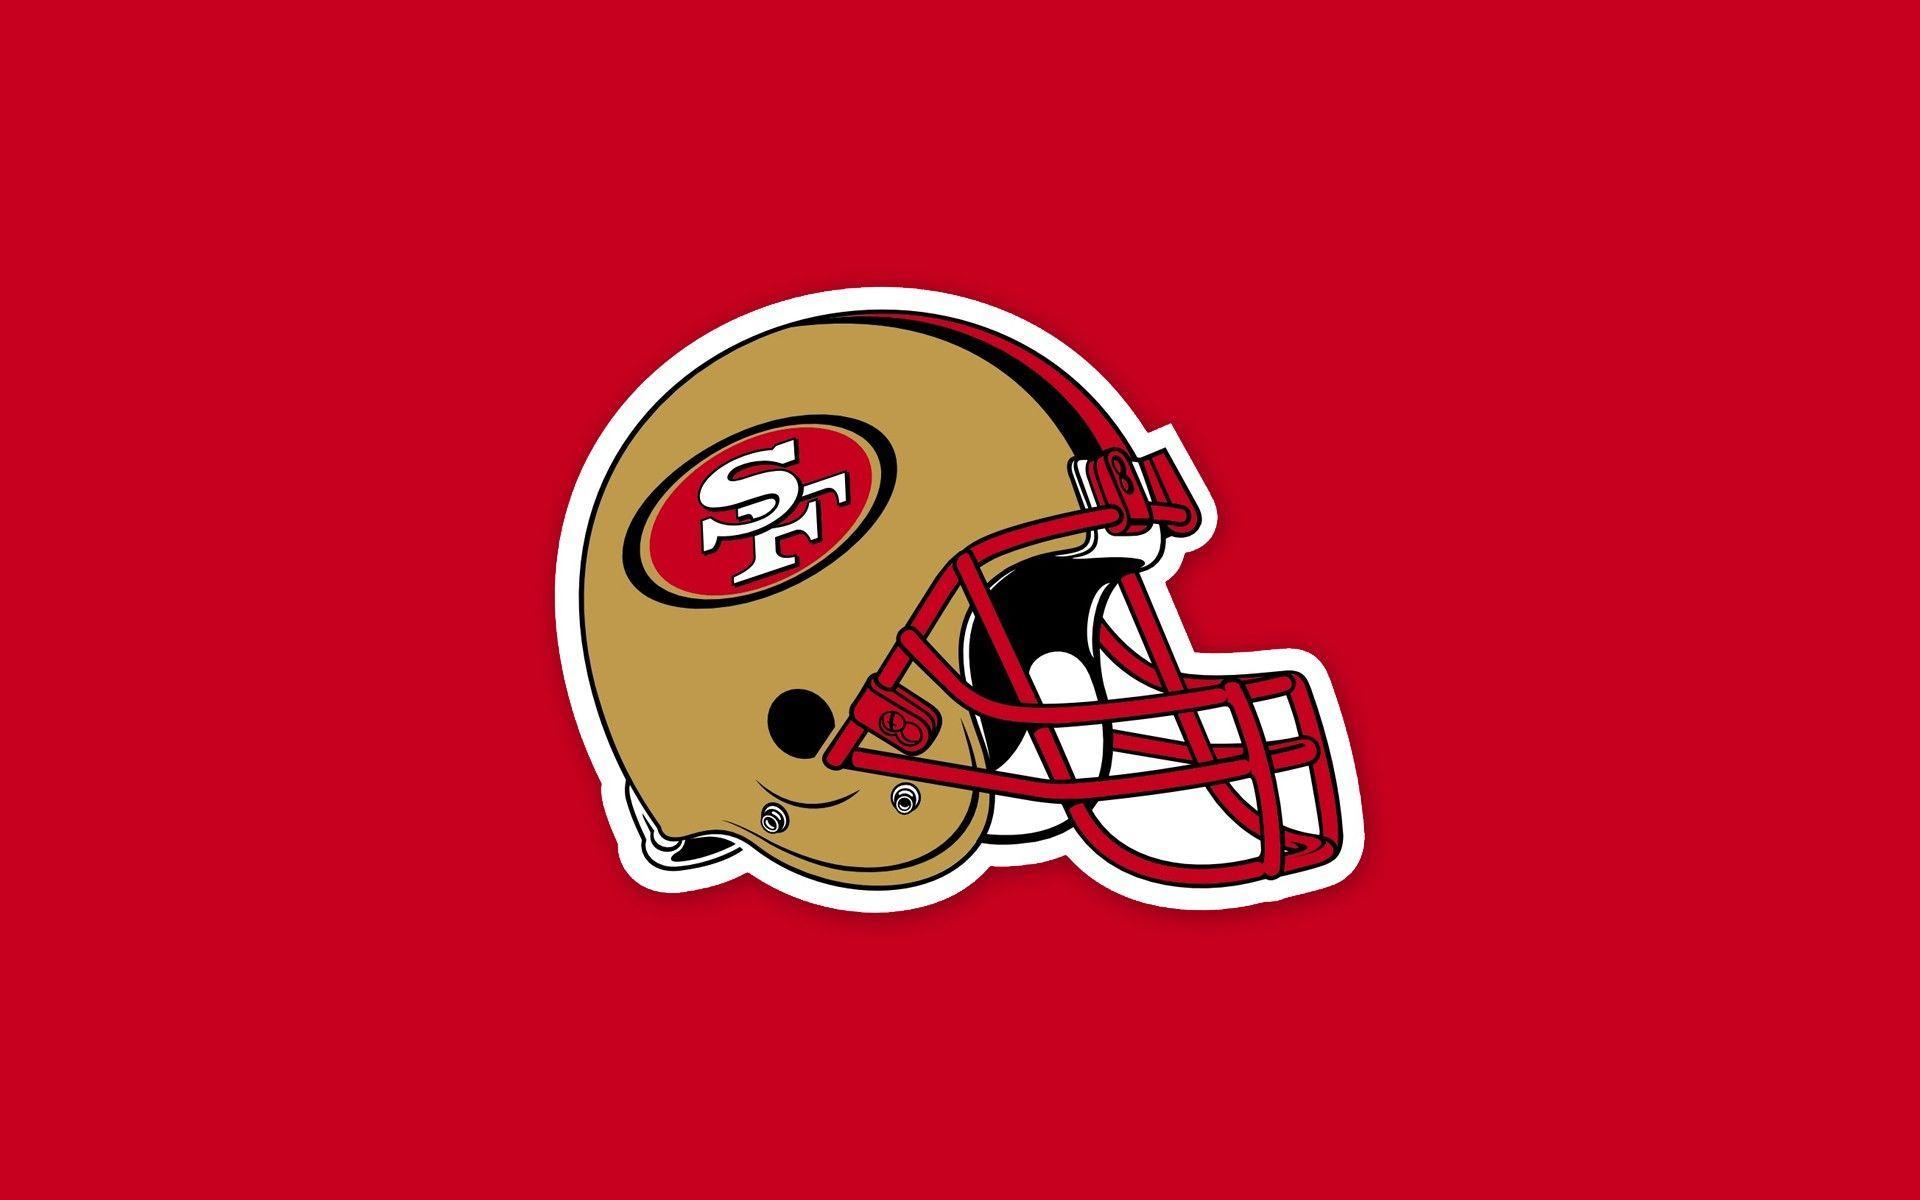 San Francisco 49ers Wallpapers Top Free San Francisco 49ers